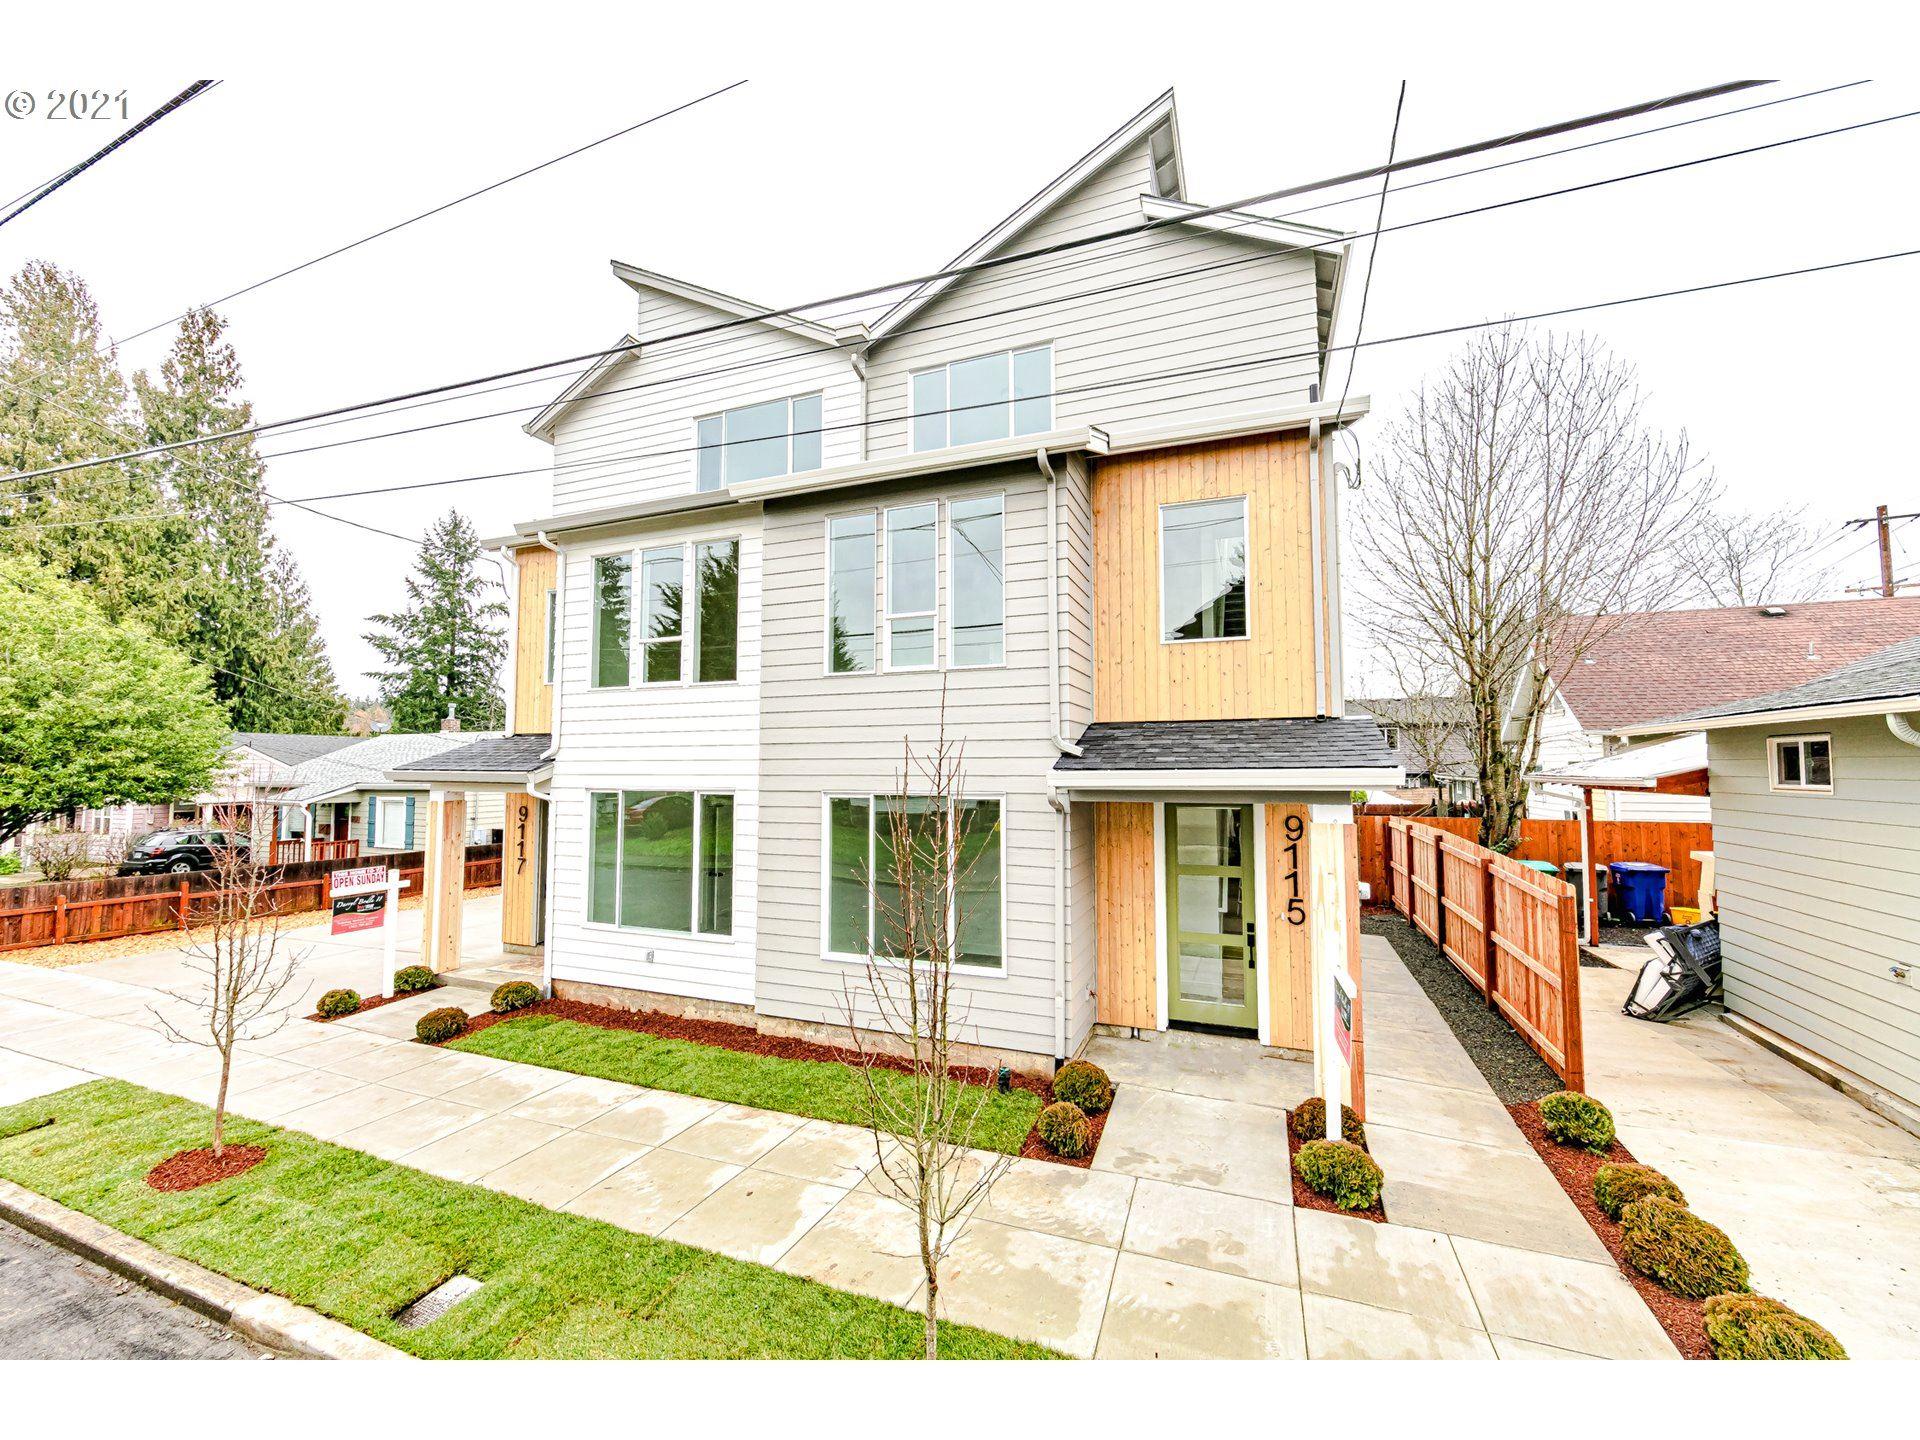 9115 N HUDSON ST, Portland, OR 97203 - MLS#: 21658545